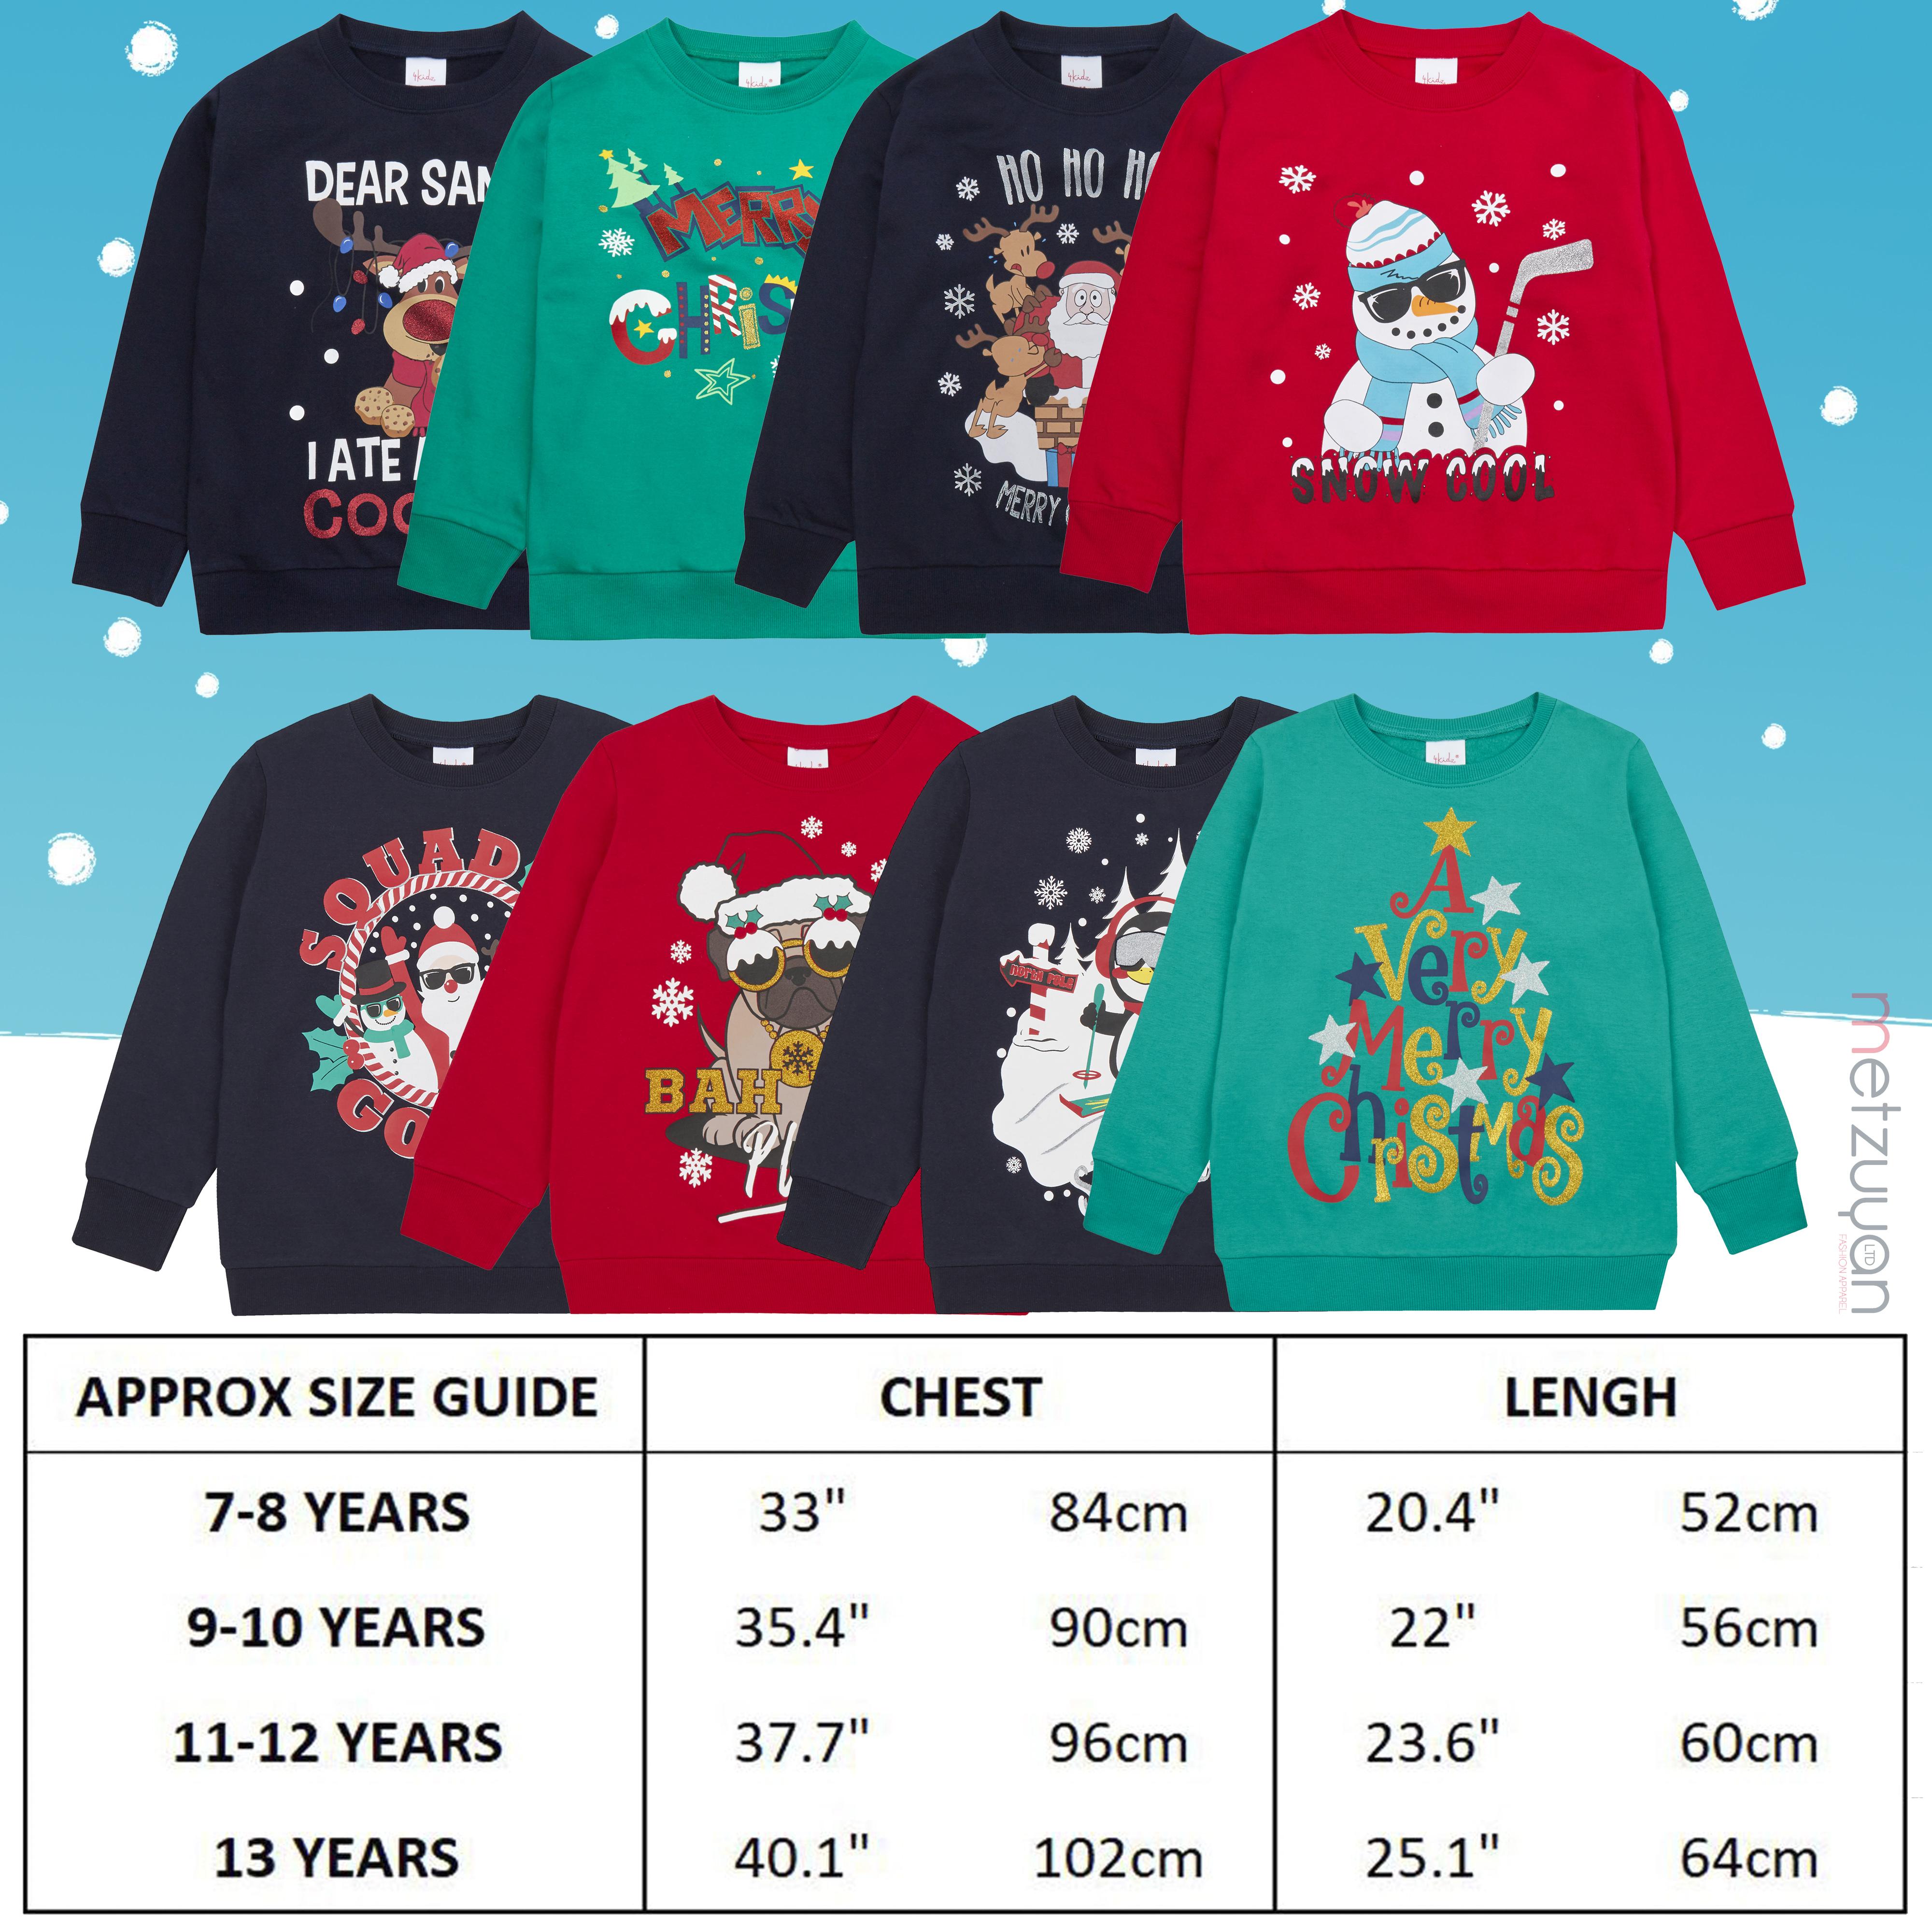 Enfants-Garcons-Filles-Noel-Noel-Pull-Sweat-shirt-Carlin-Glitter-chaud miniature 23